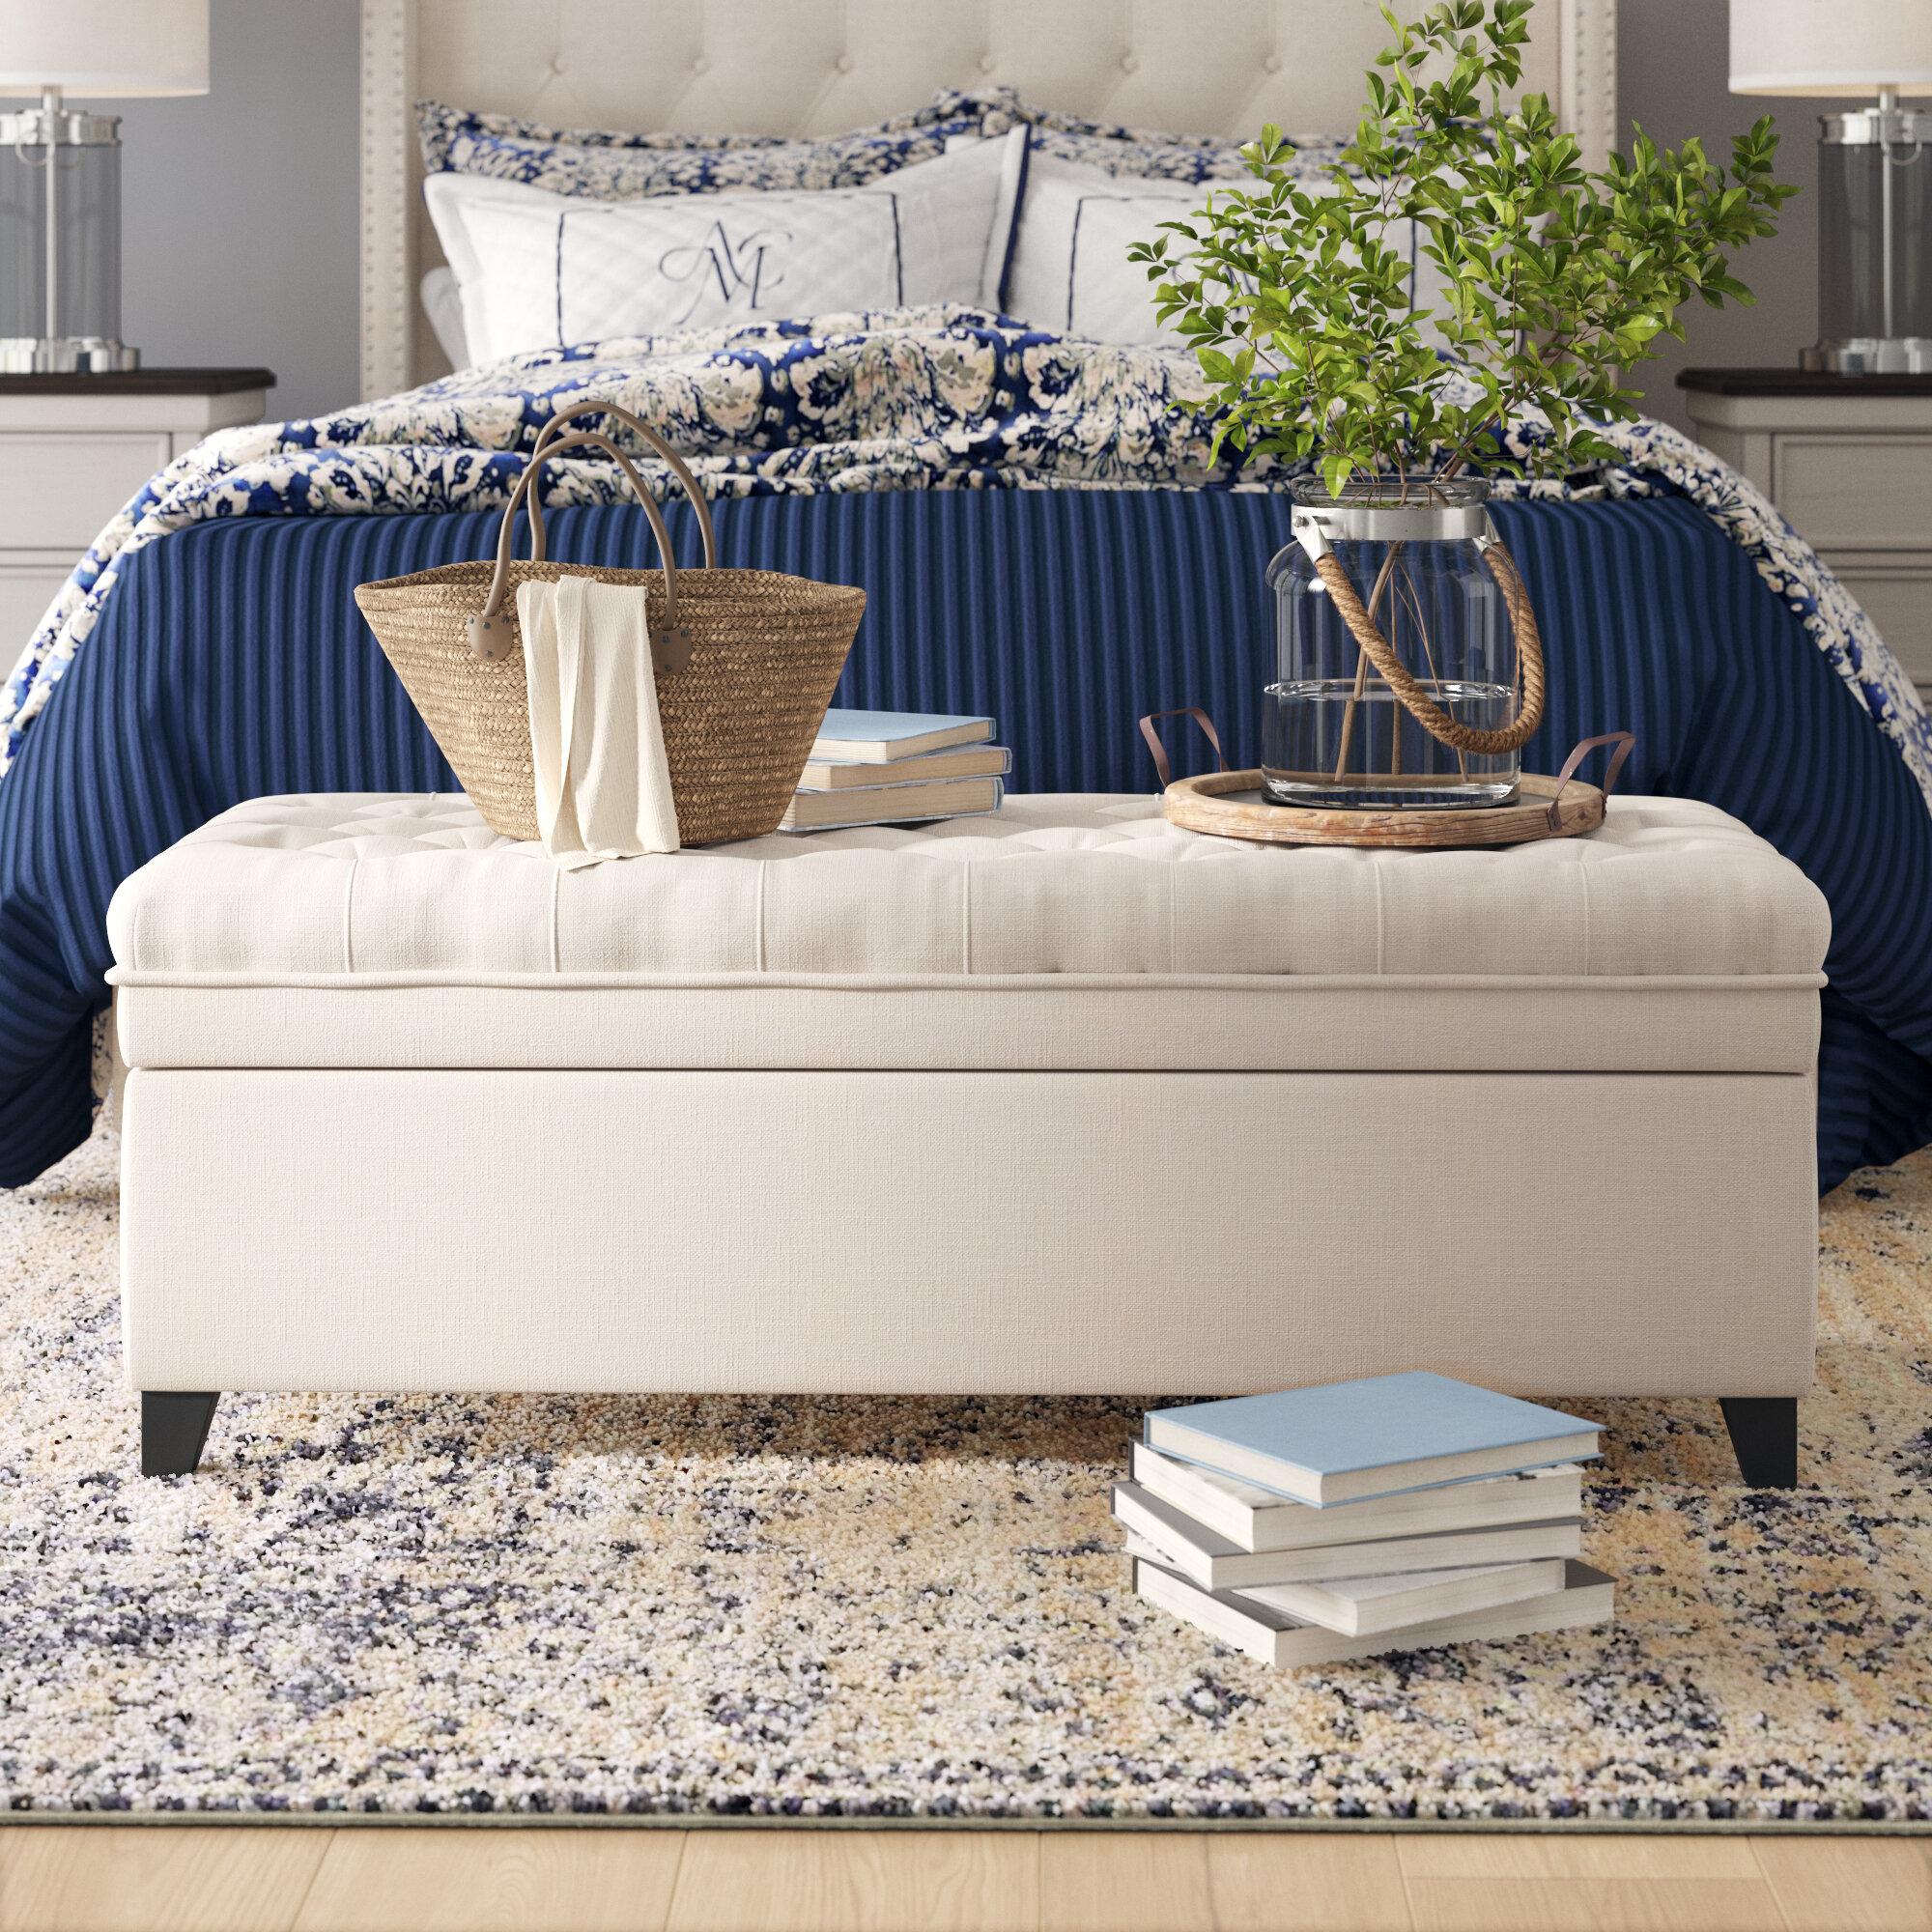 Terrific Birch Lane Heritage Logan Tufted Storage Ottoman Andrewgaddart Wooden Chair Designs For Living Room Andrewgaddartcom